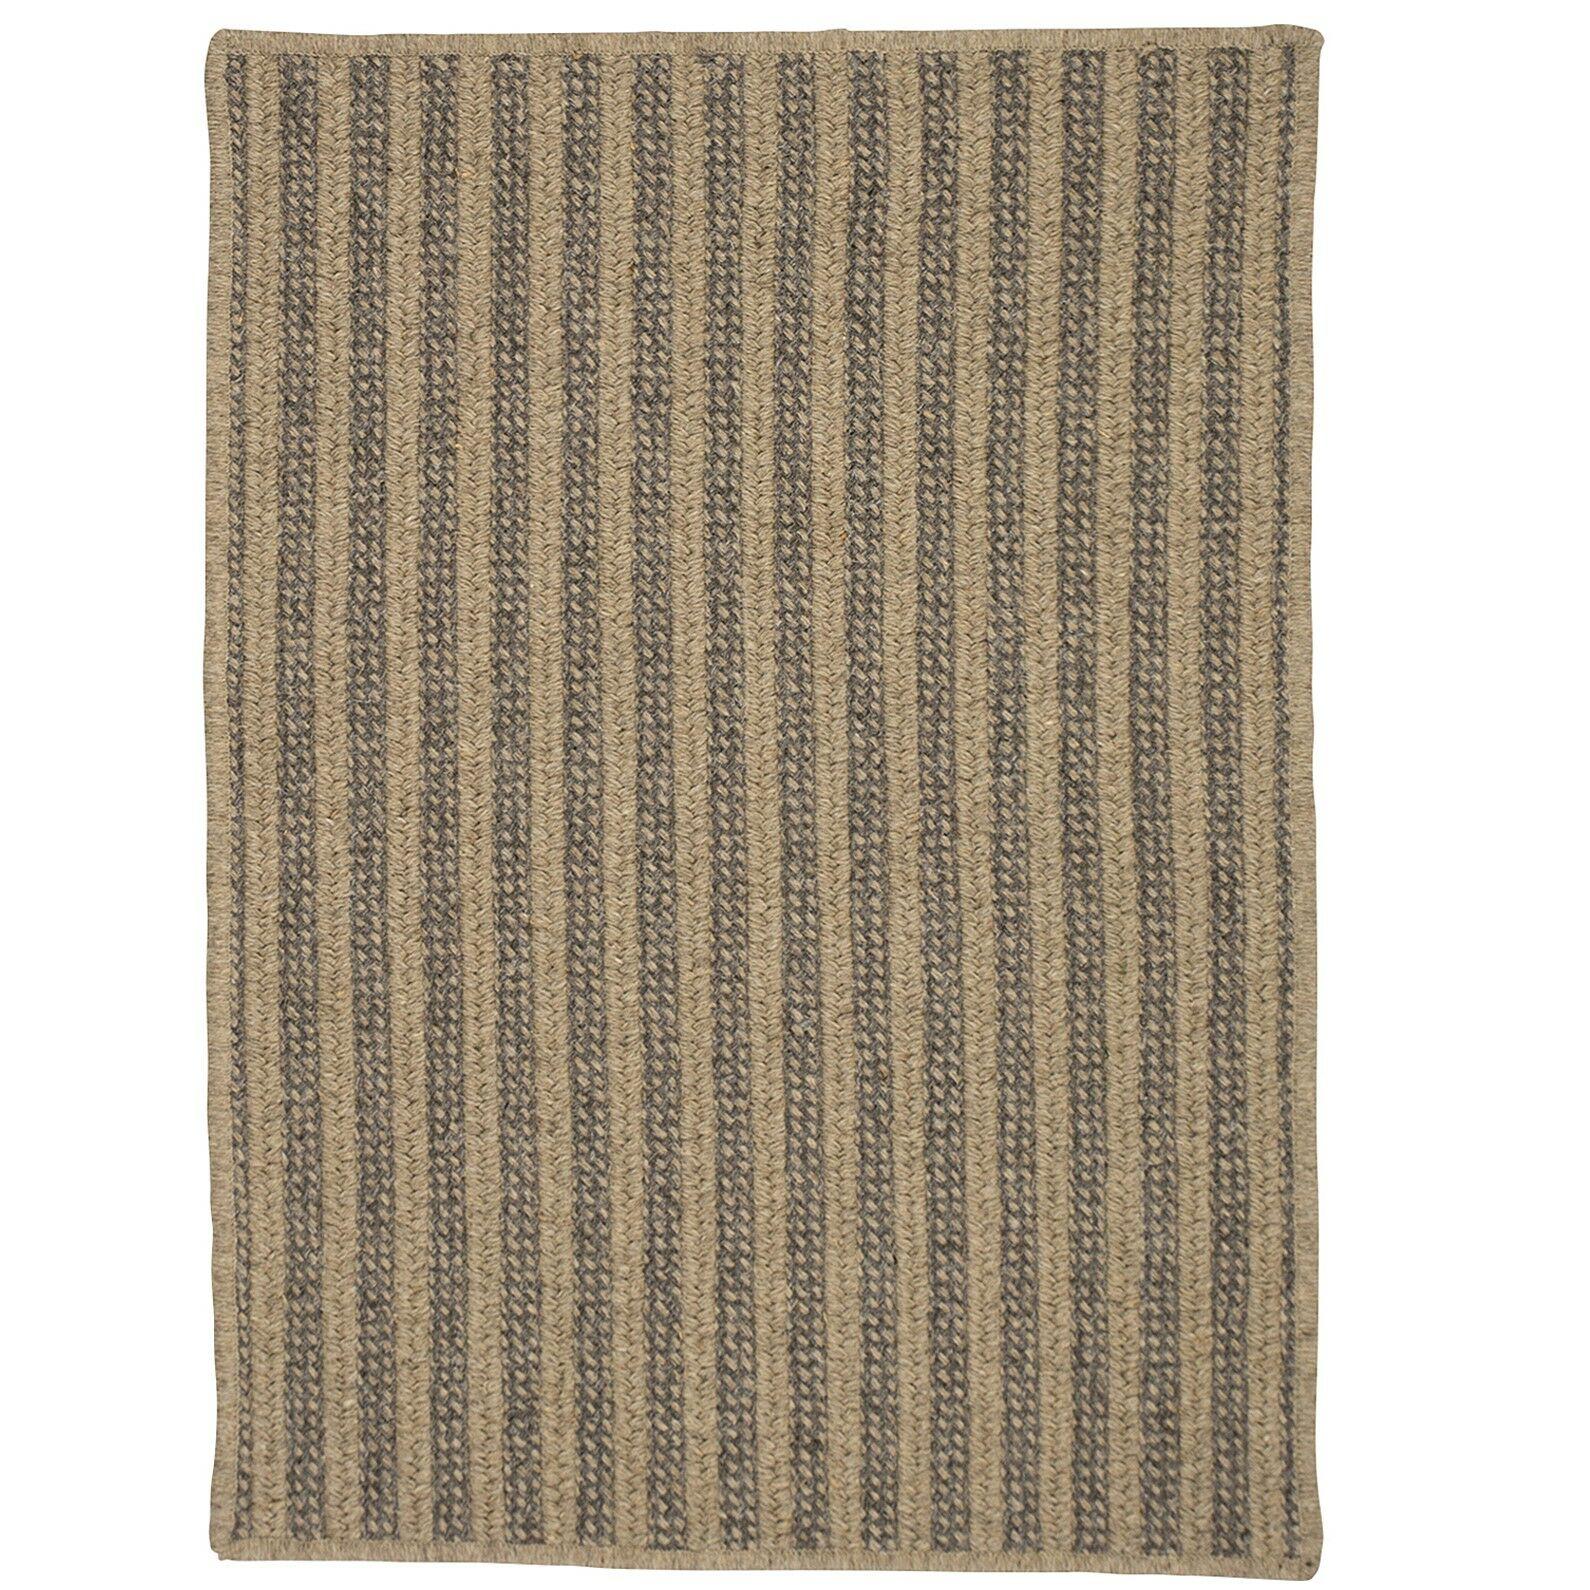 Cadenville Hand-Woven Area Rug Rug Size: Rectangle 8' x 10'